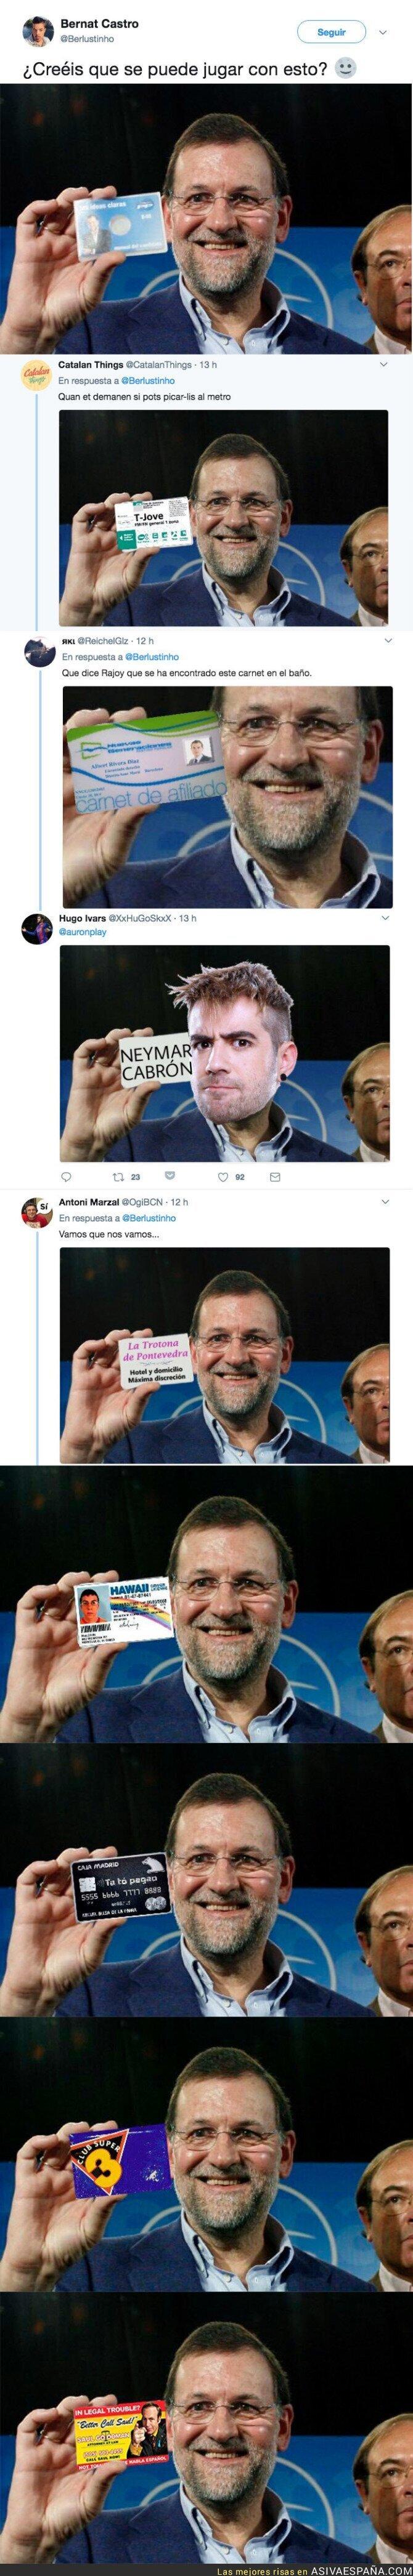 72955 - Internet se llena de memes tras esta foto de Rajoy mostrando un carné